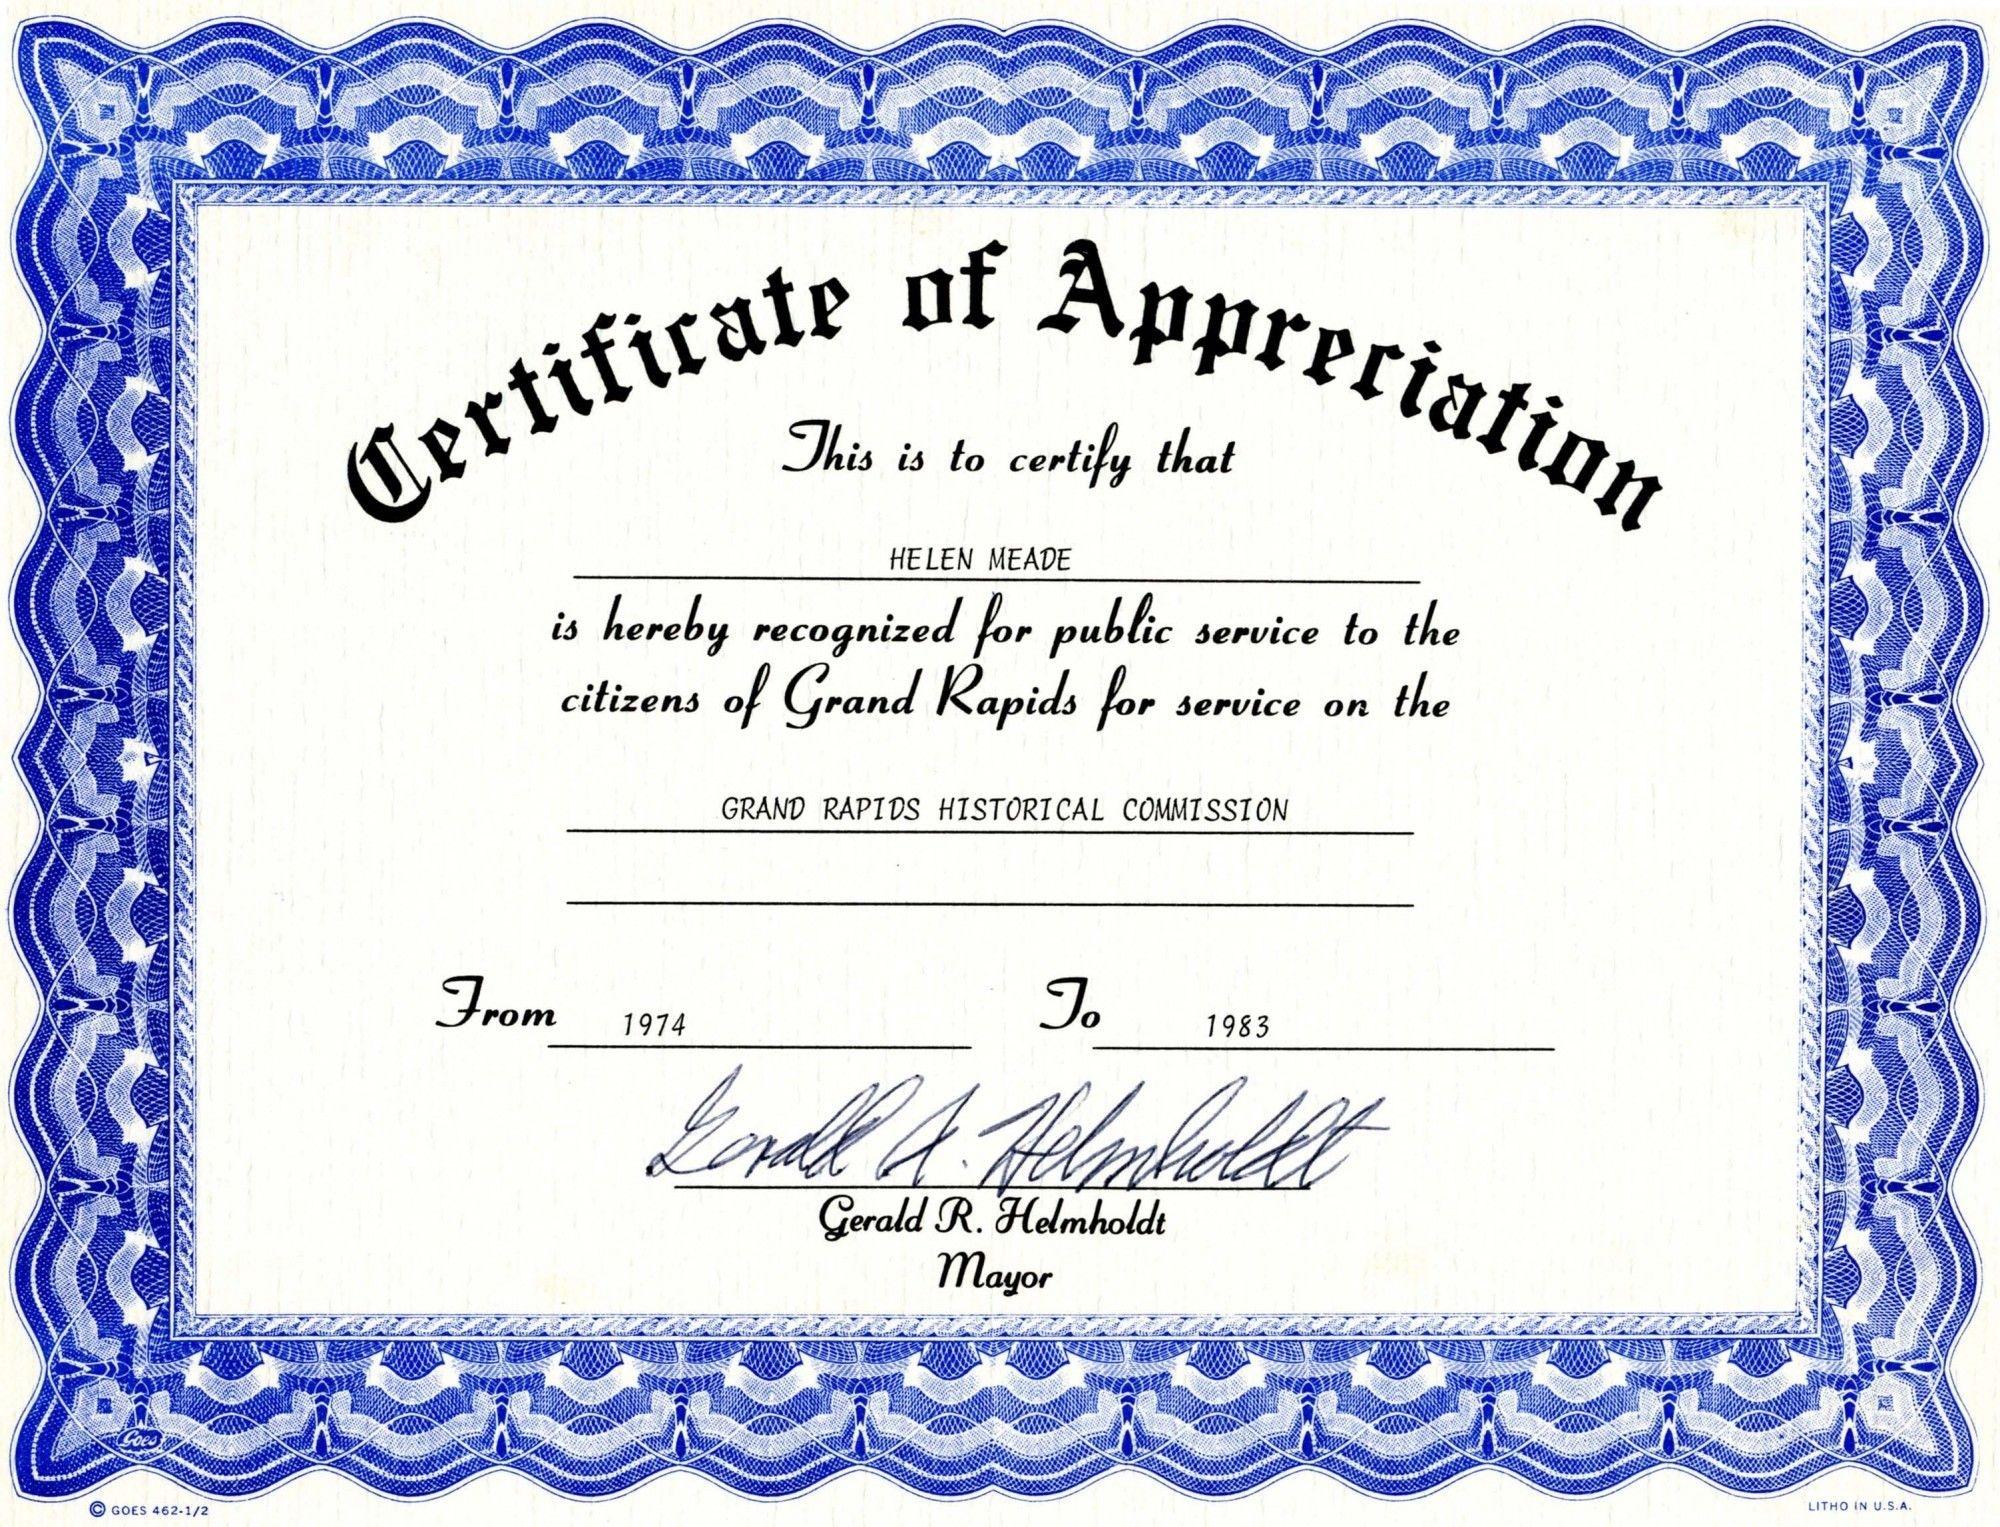 Appreciation Certificate Templates Free Download | Besttemplates123 - Free Printable Blank Certificate Templates